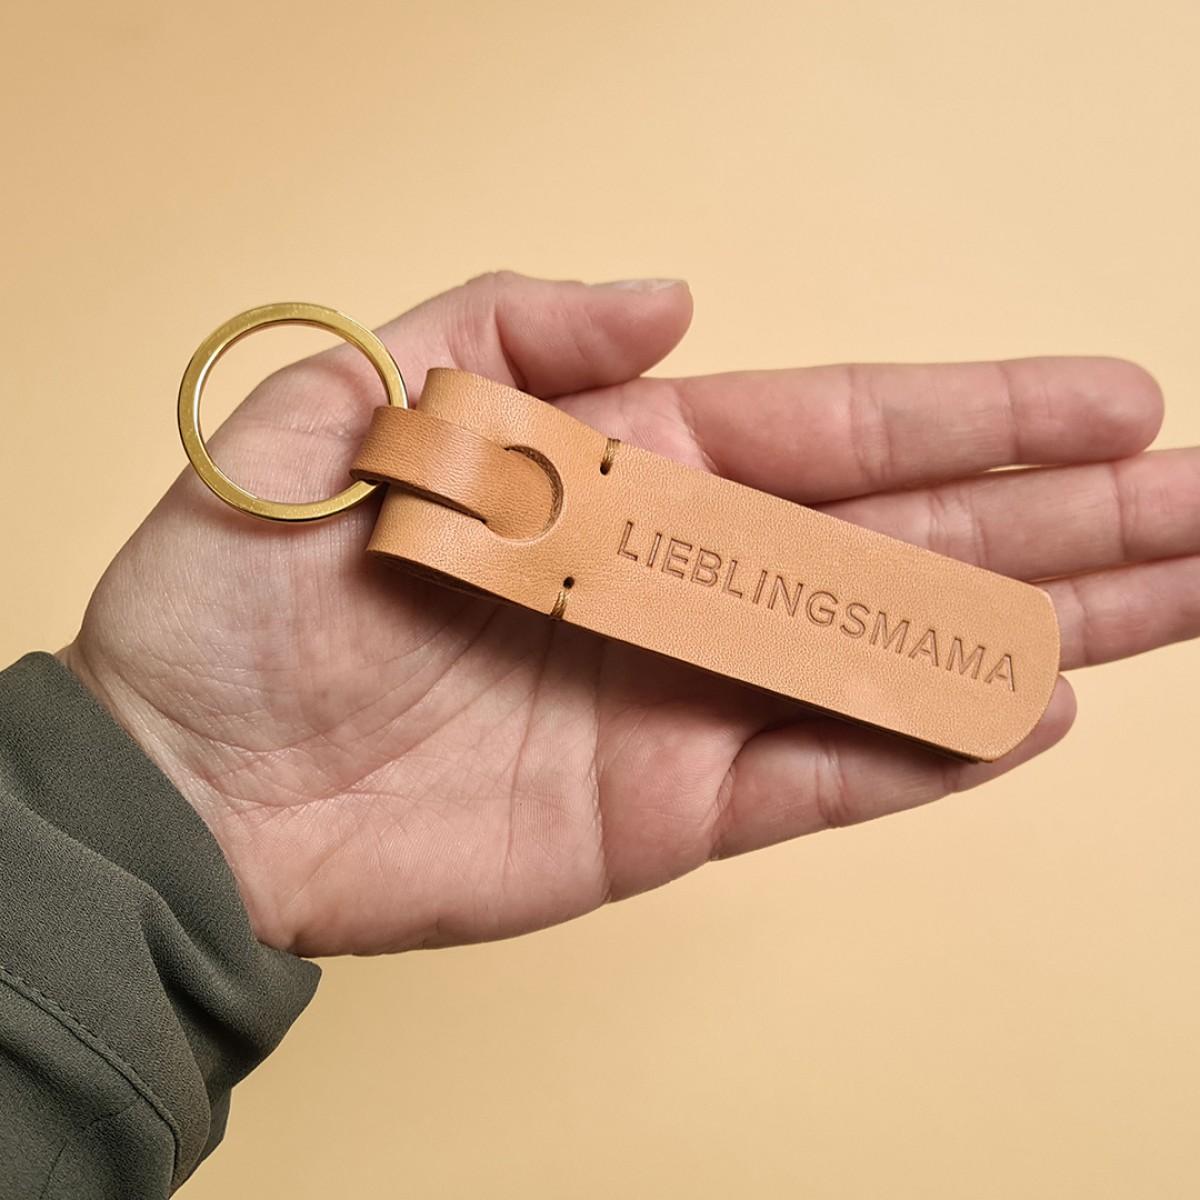 Laura Stolz / Schlüsselanhänger aus Naturleder / Prägung «LIEBLINGSMAMA» / beige